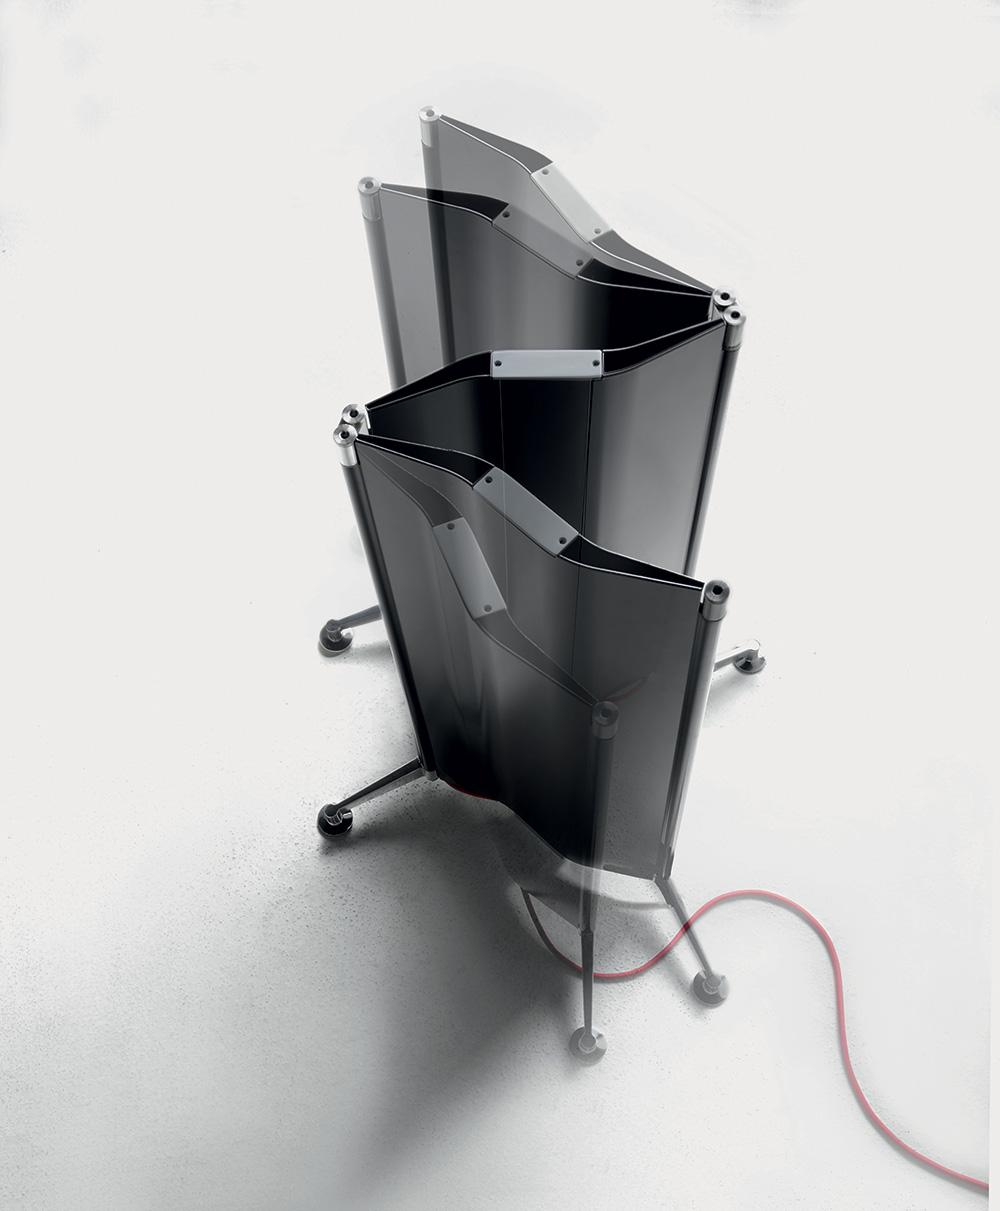 Origami של אלברטו מדה ל-Tubes Radiatori. הראשון בקטגוריית חדרי הרחצה